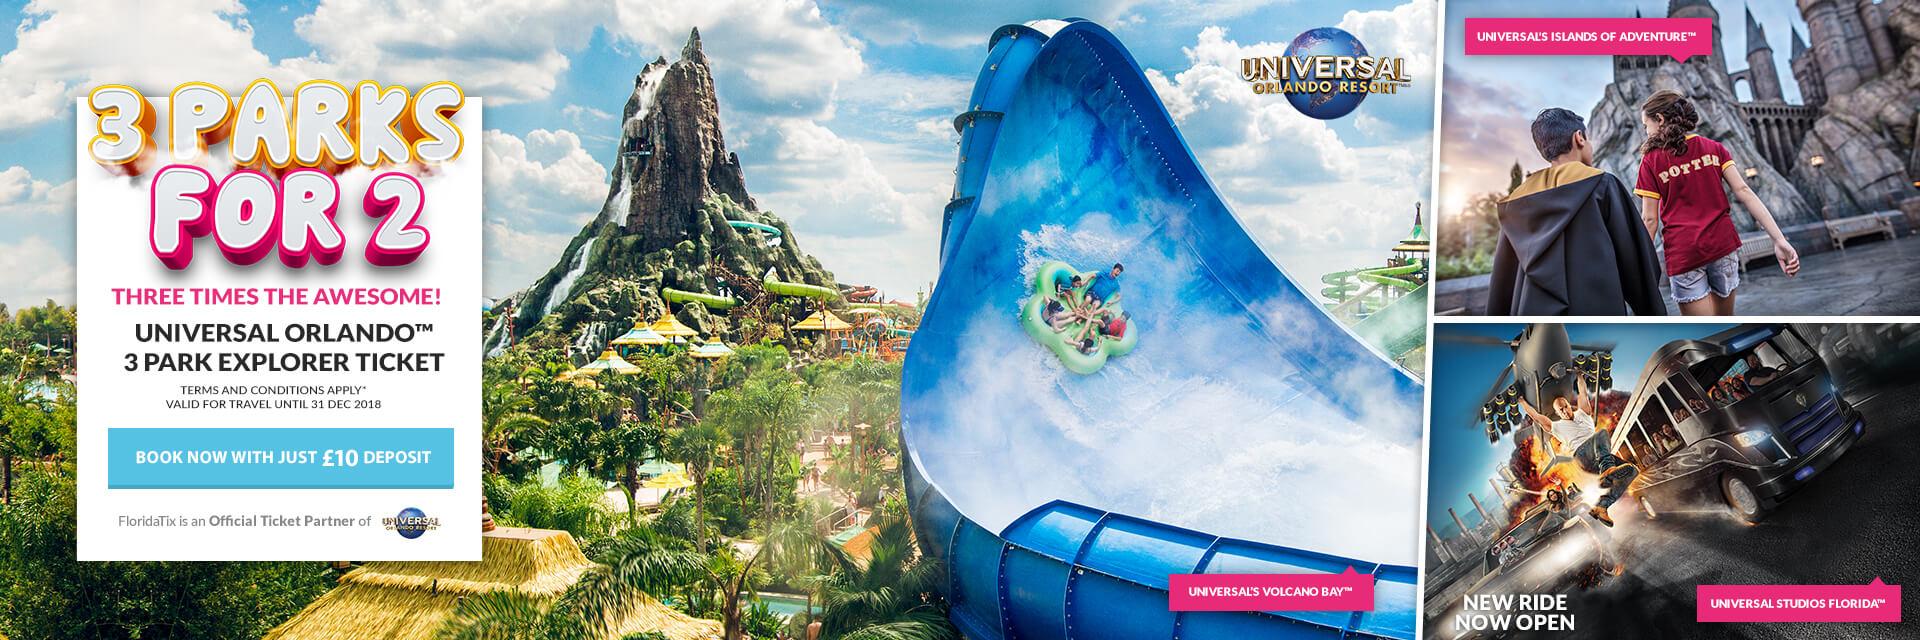 Universal 3 Parks for 2 Offer